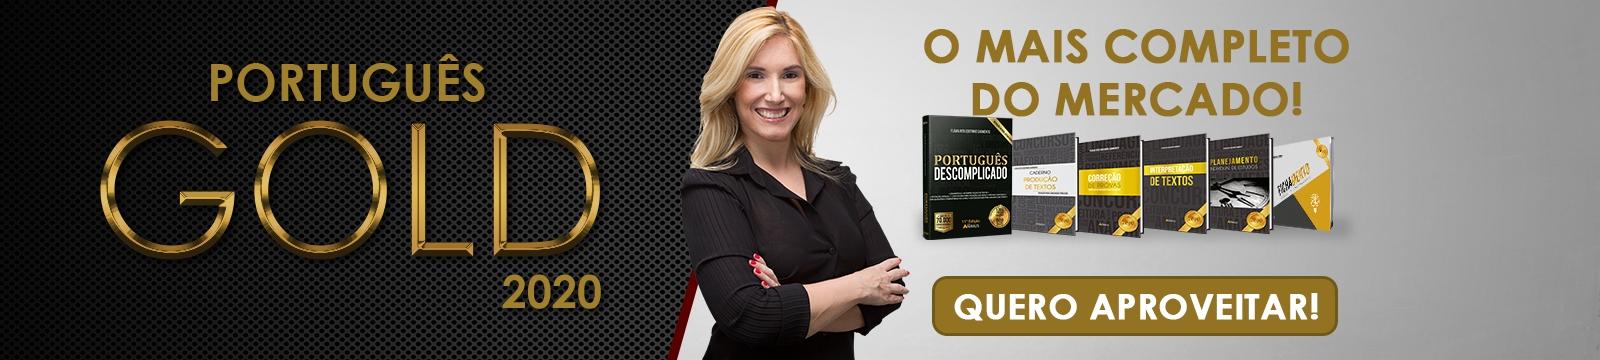 [Novo Português Gold 2020]